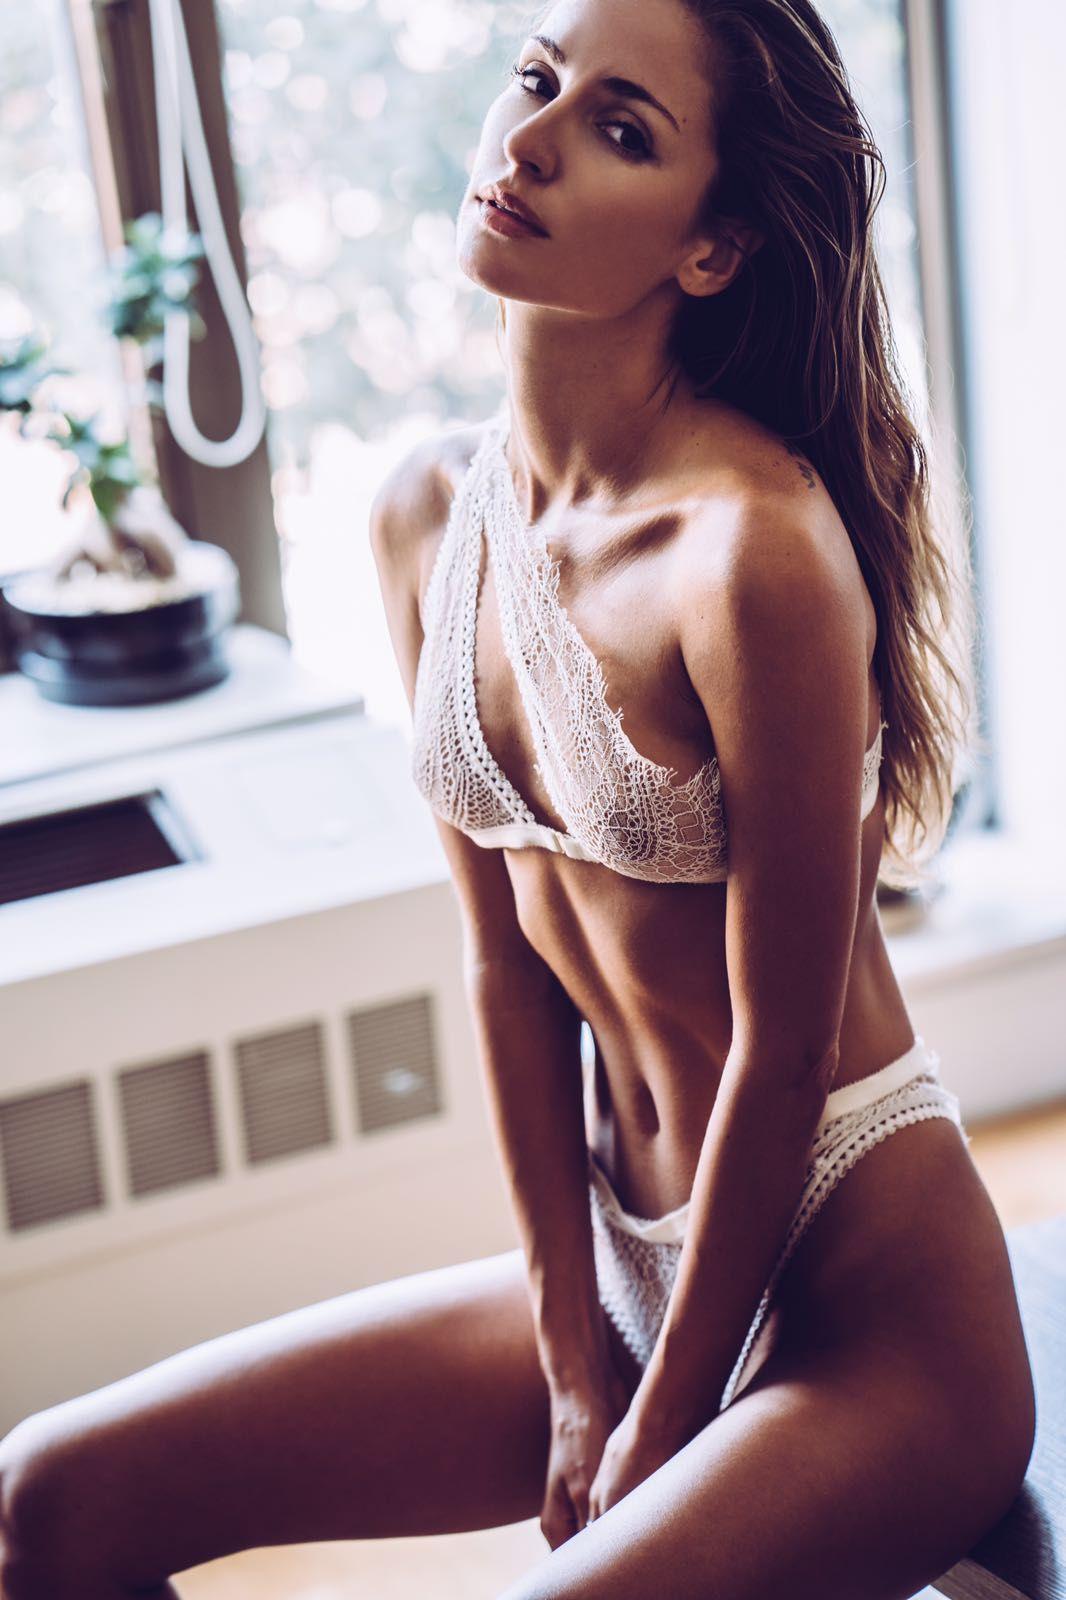 Photos Elen Dali nude (97 photo), Pussy, Leaked, Boobs, butt 2018